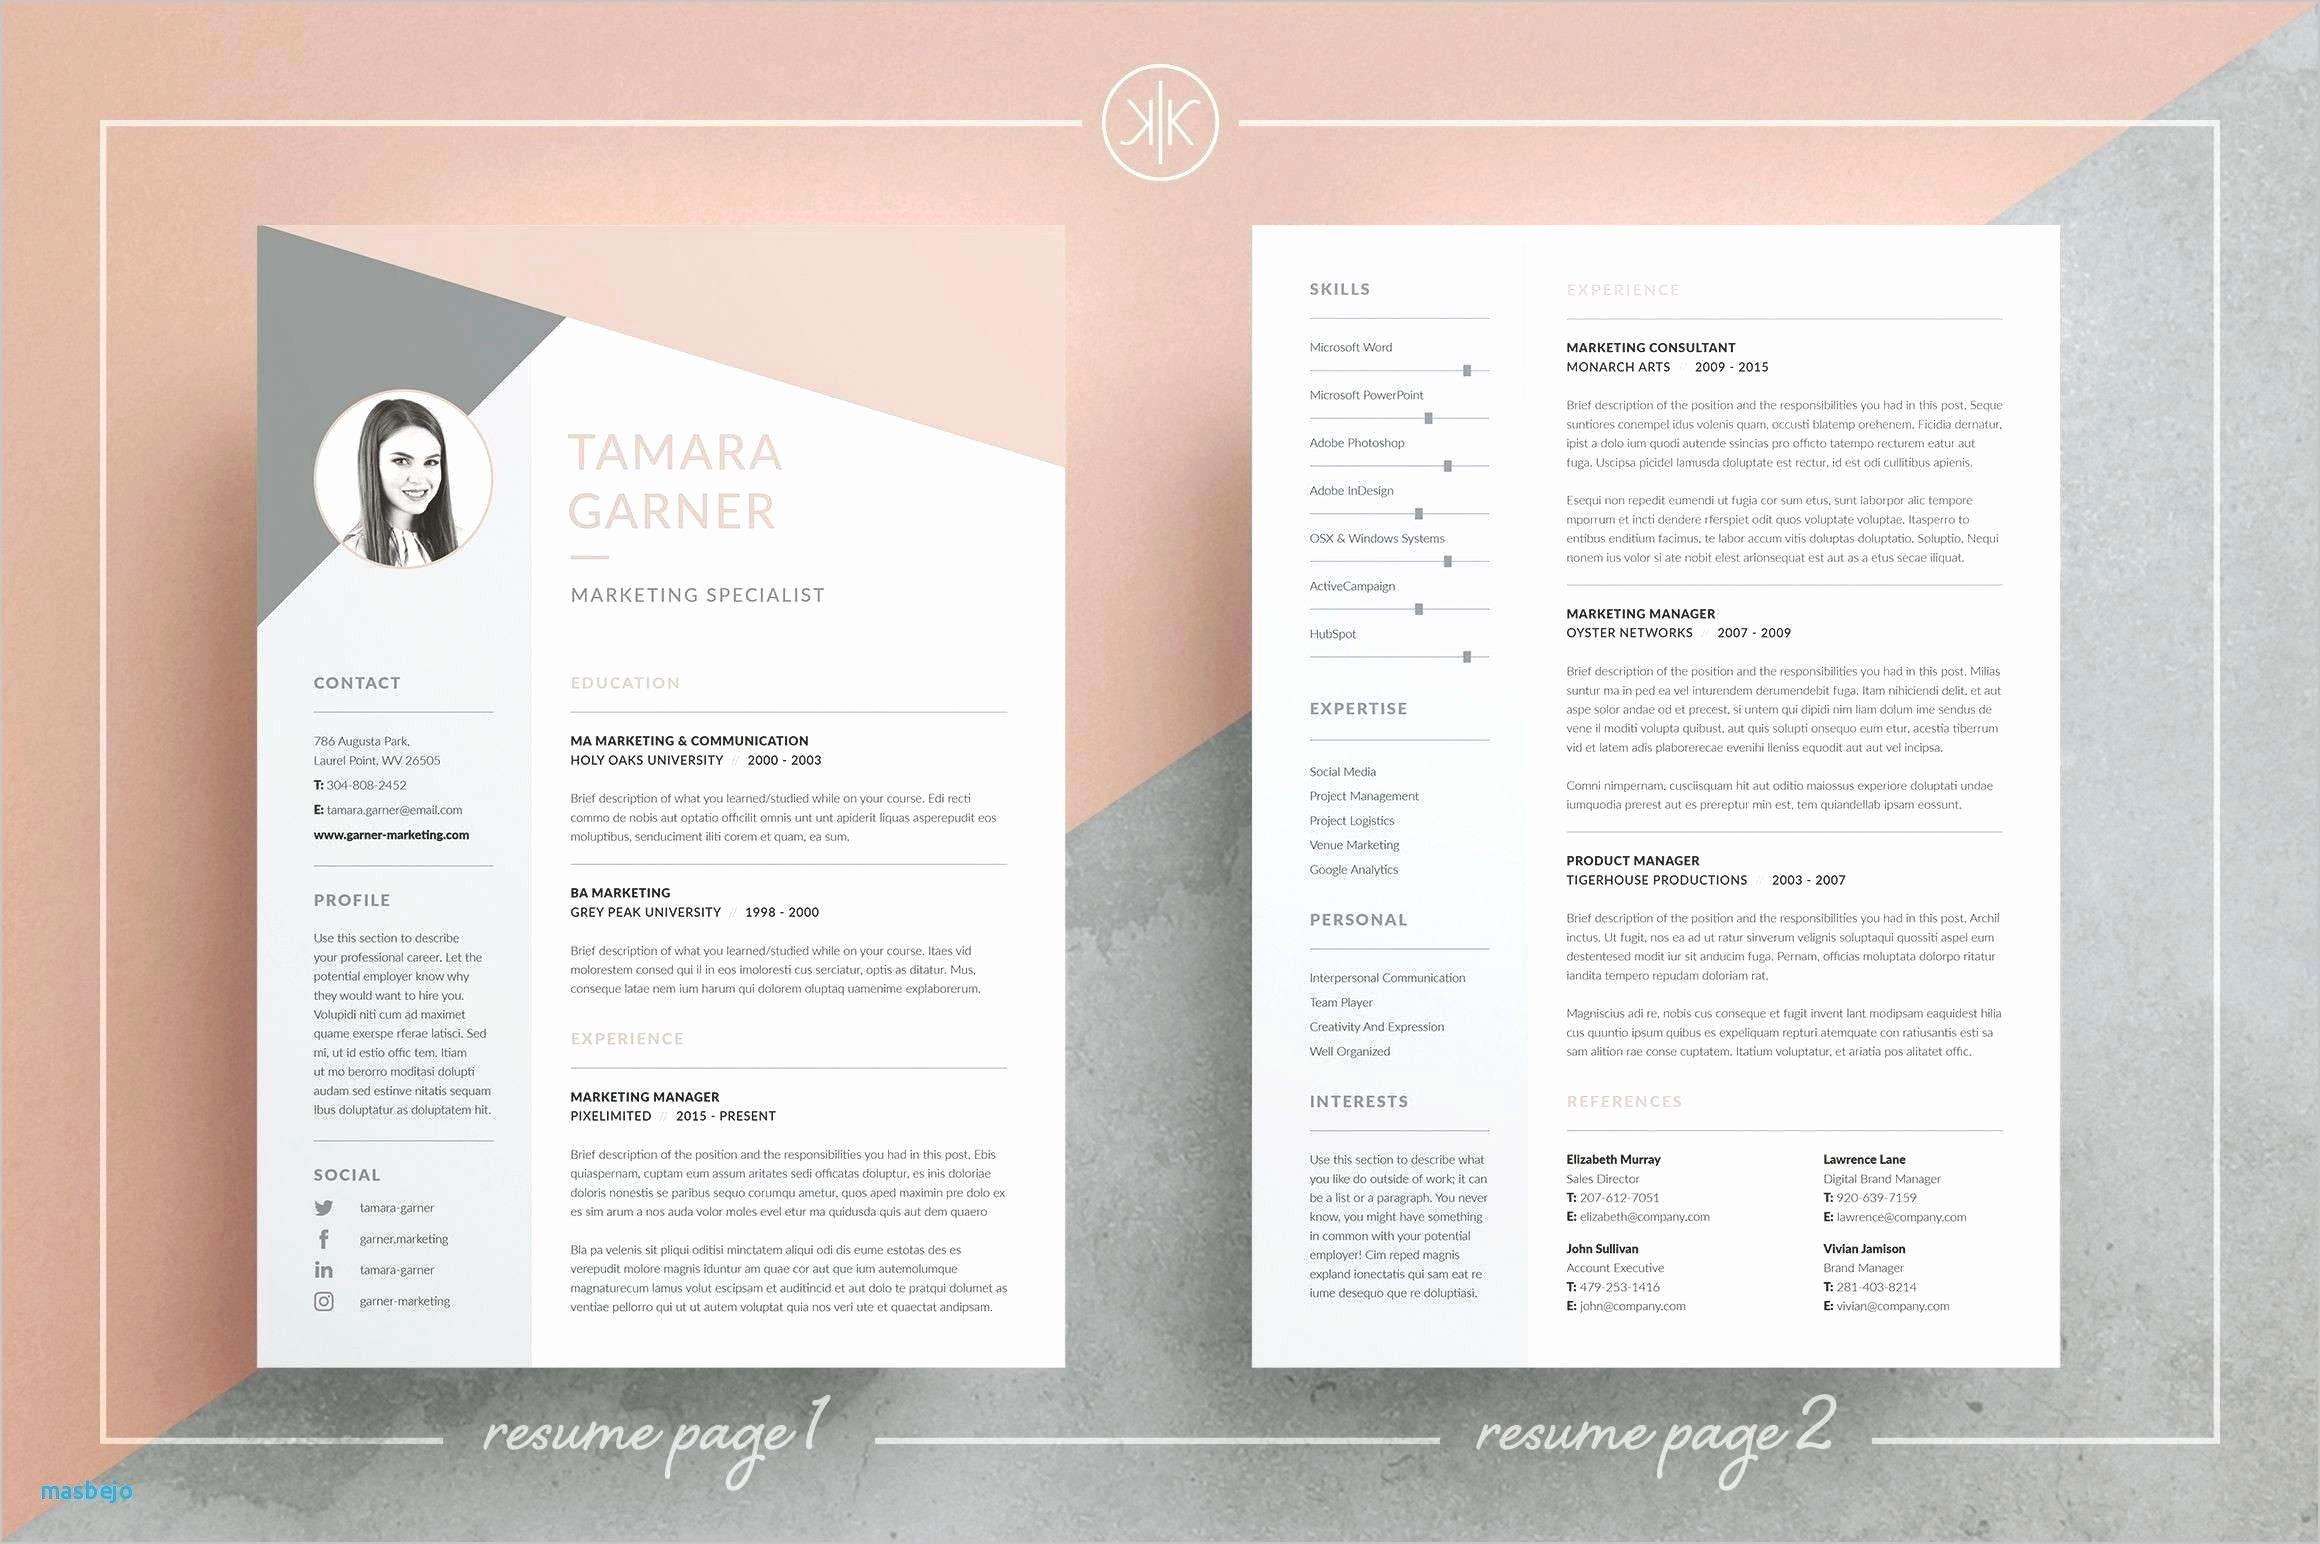 Indesign Wedding Program Template Luxury Adobe Indesign Business Card Template Inspirational Adobe